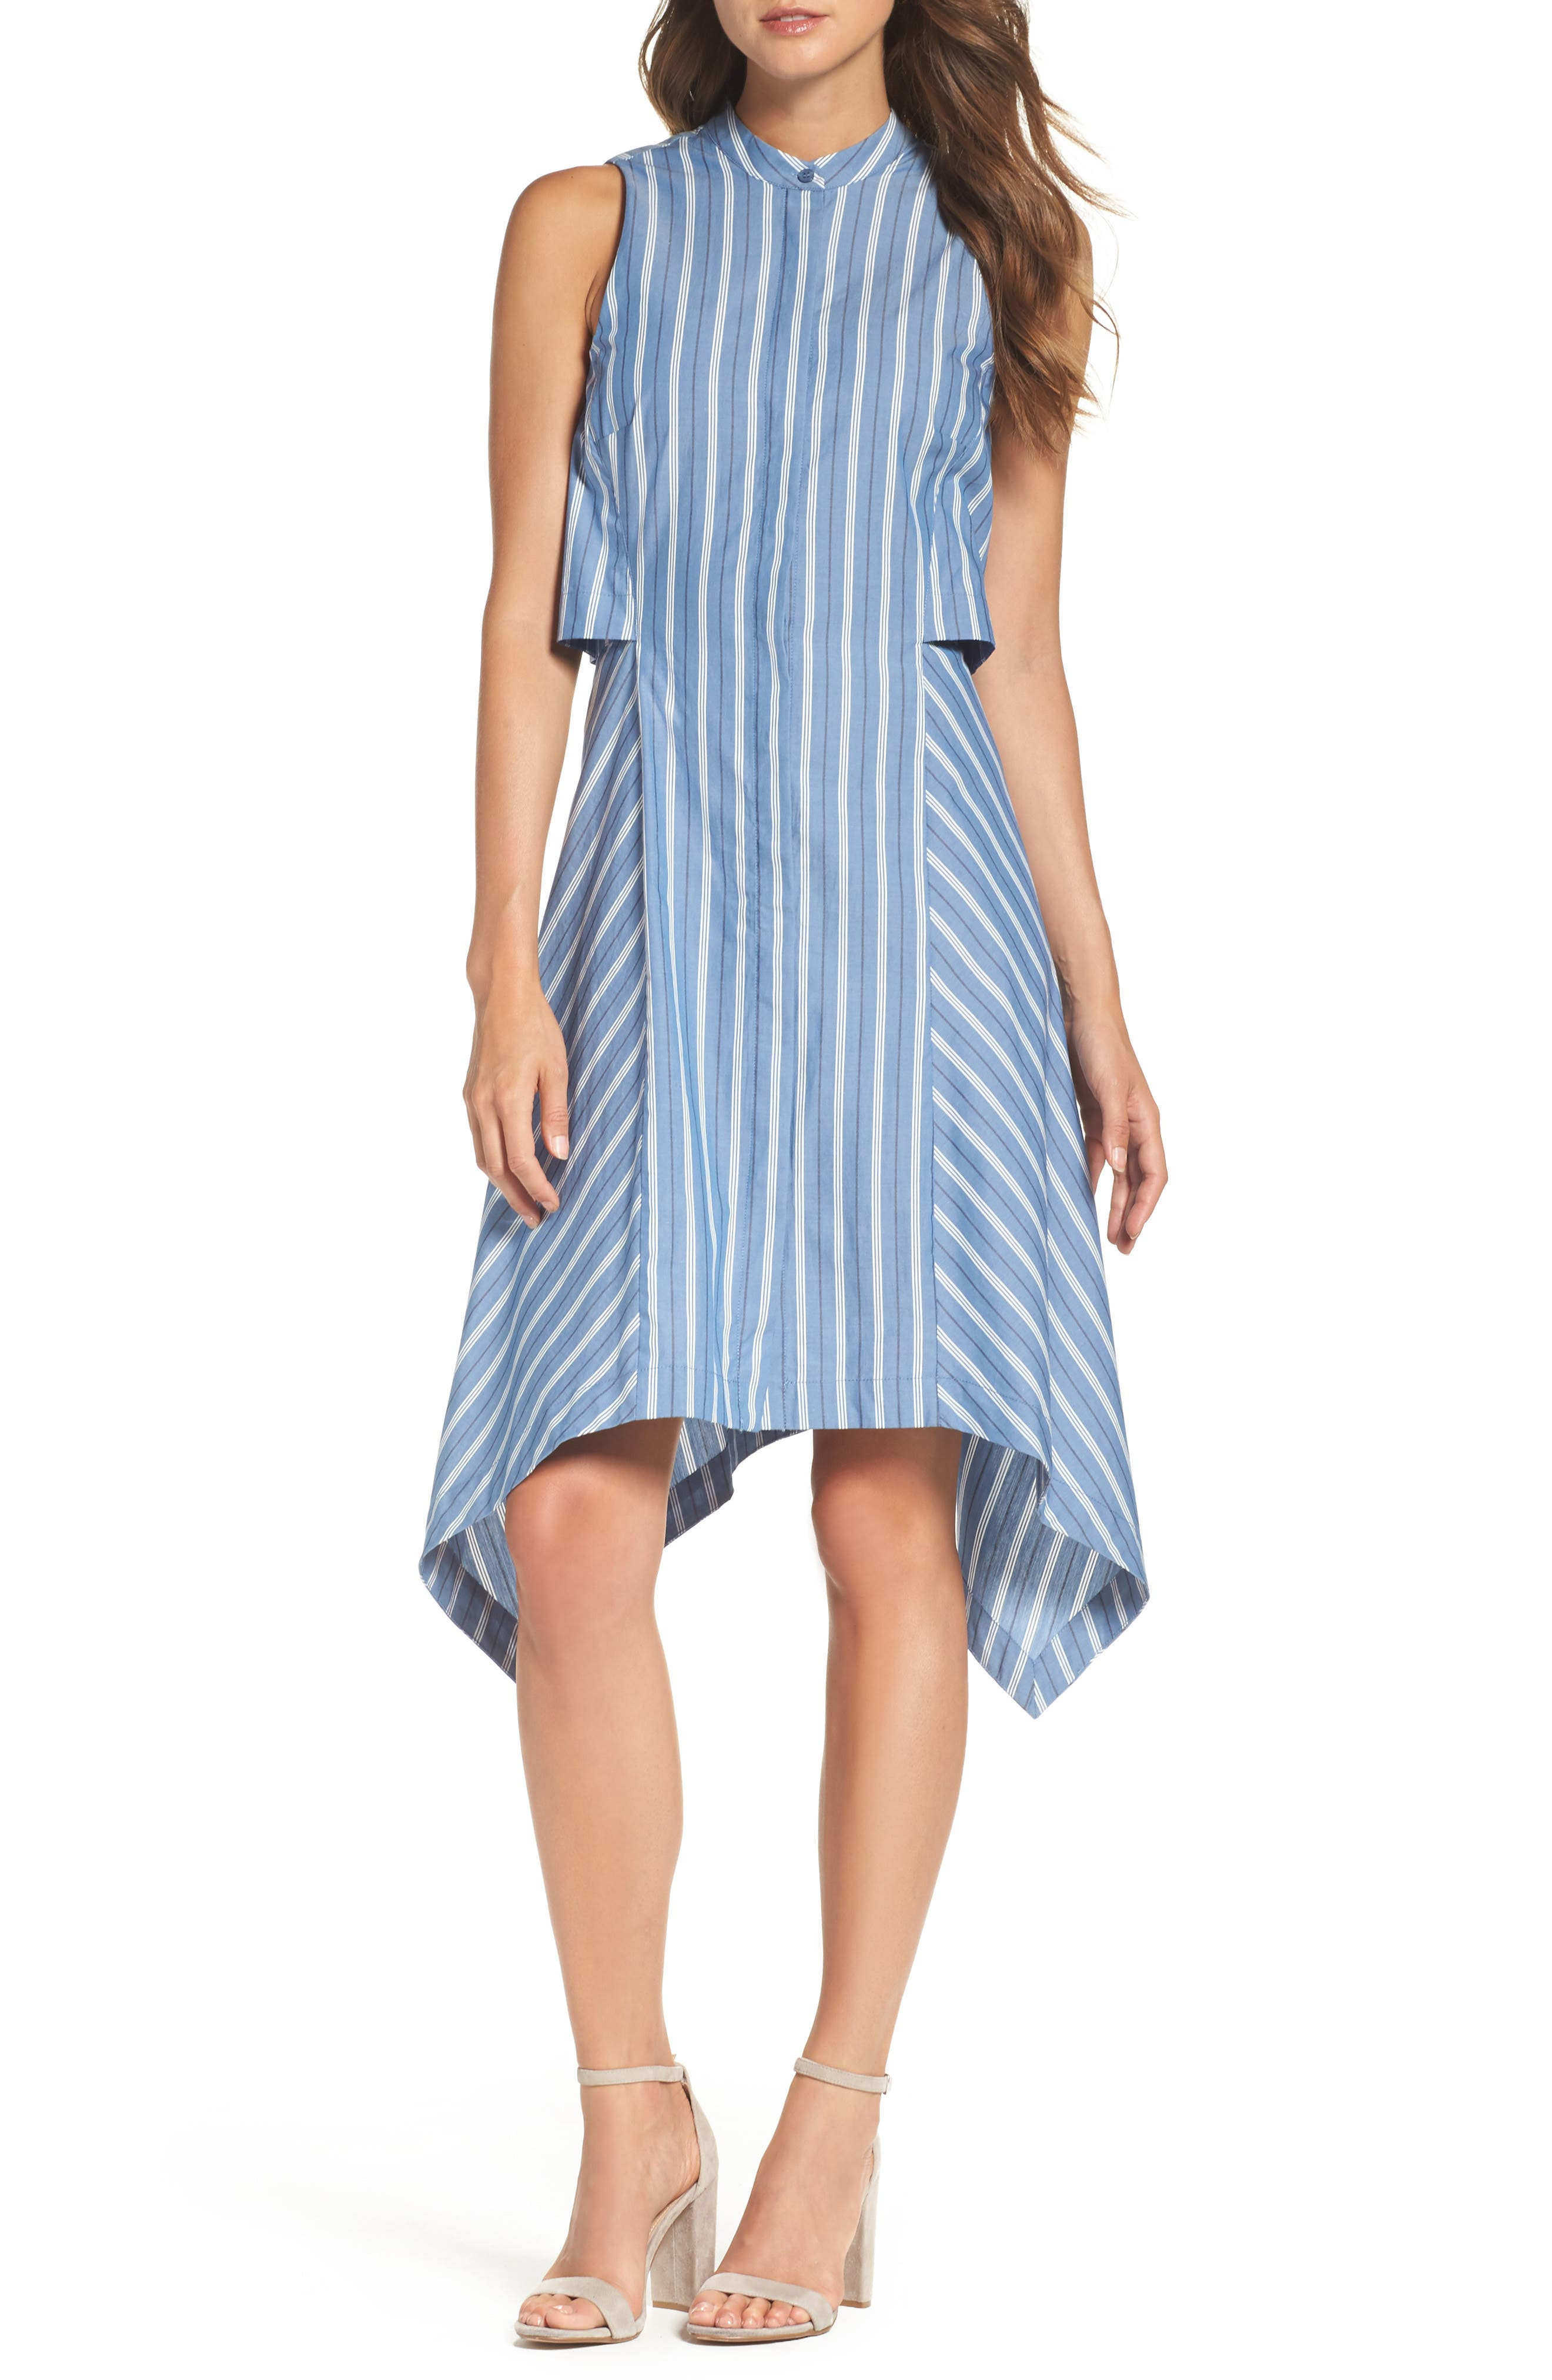 BCBGMAXAZRIA City Sleeveless Dress